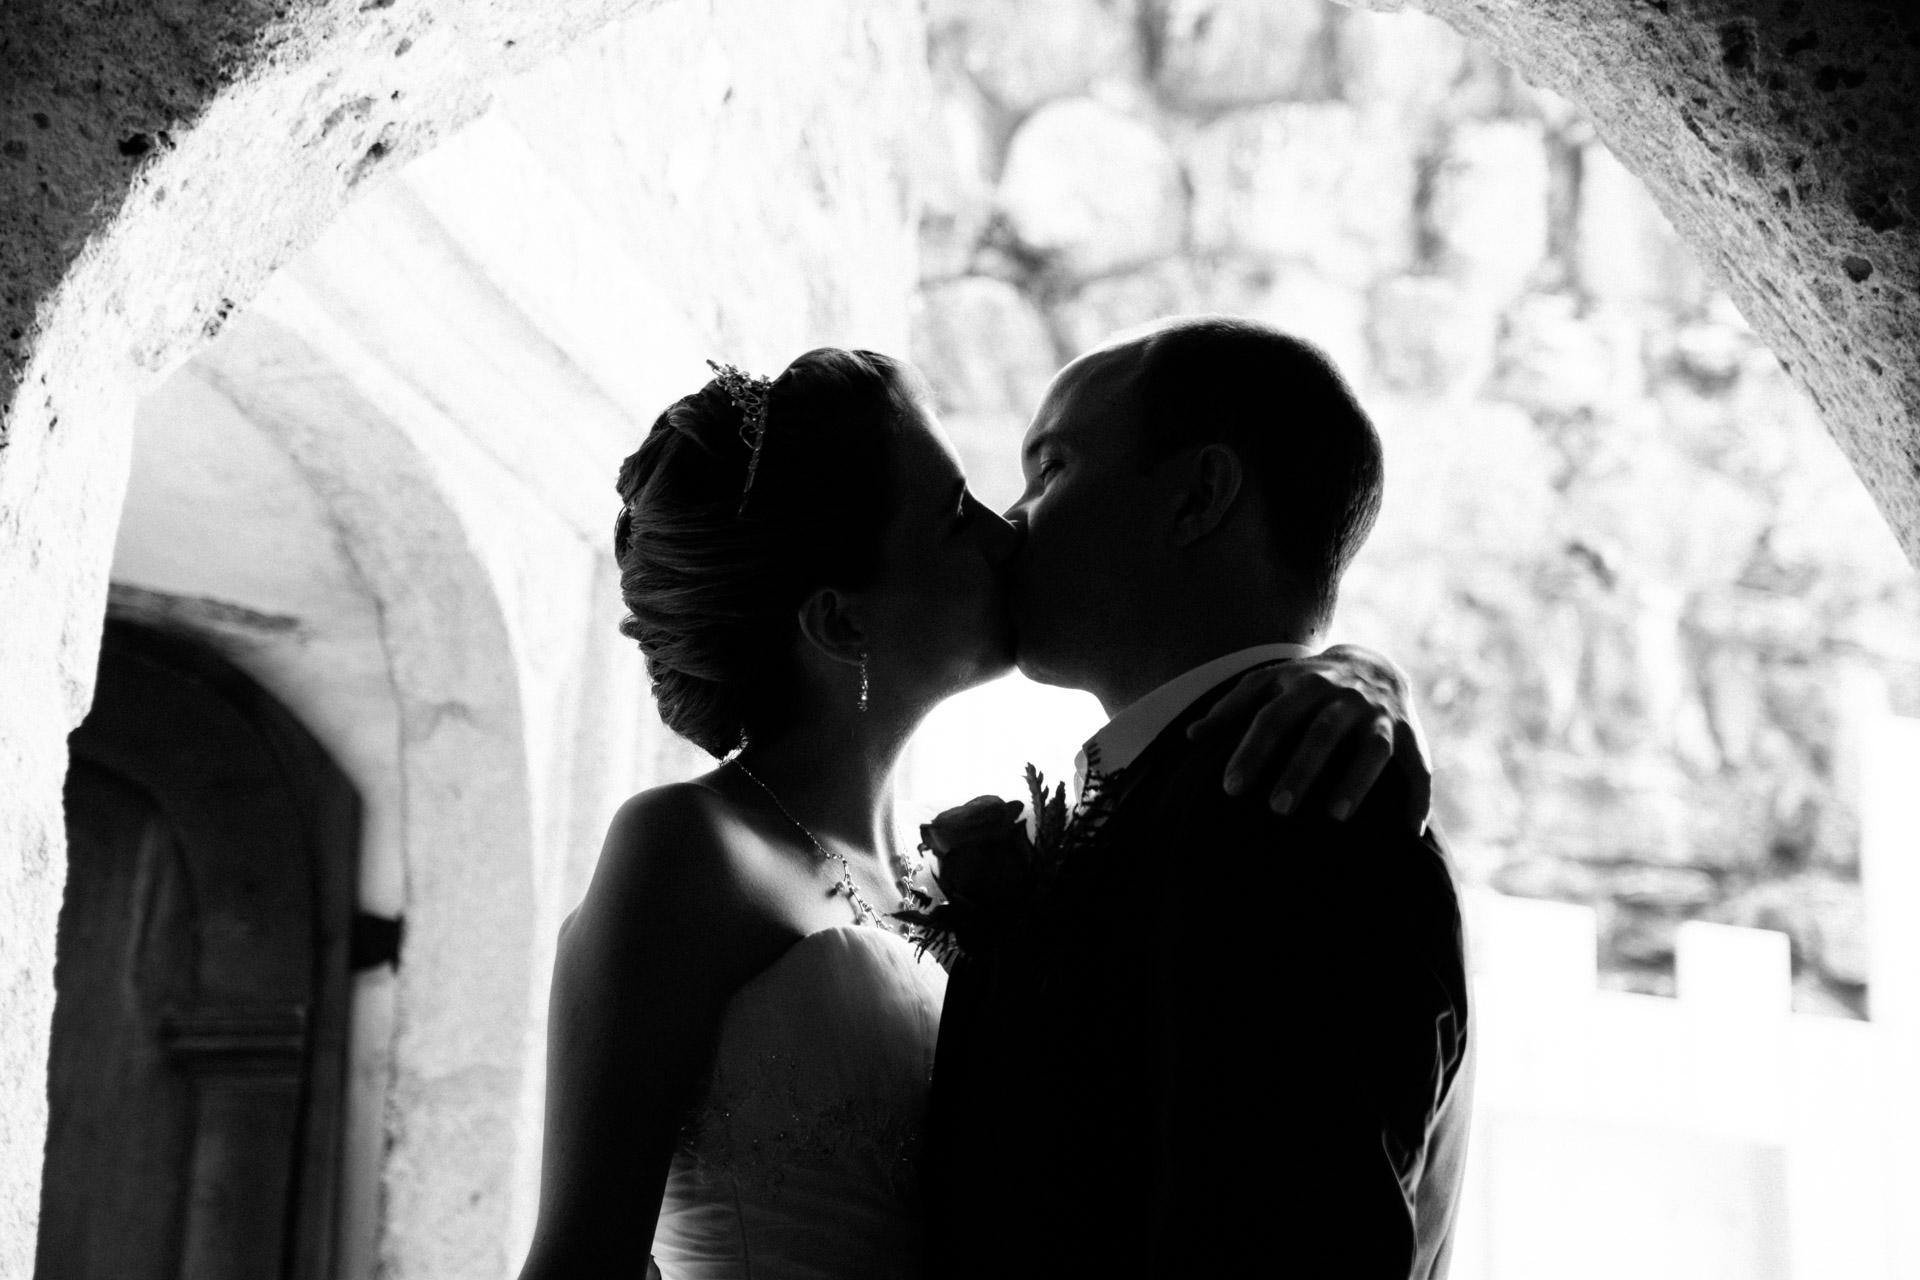 Pixelart_Hochzeitsfotografen_Loerrach_Rheinfelden_Hallwil_Schweiz_Linda-Ramon-1013